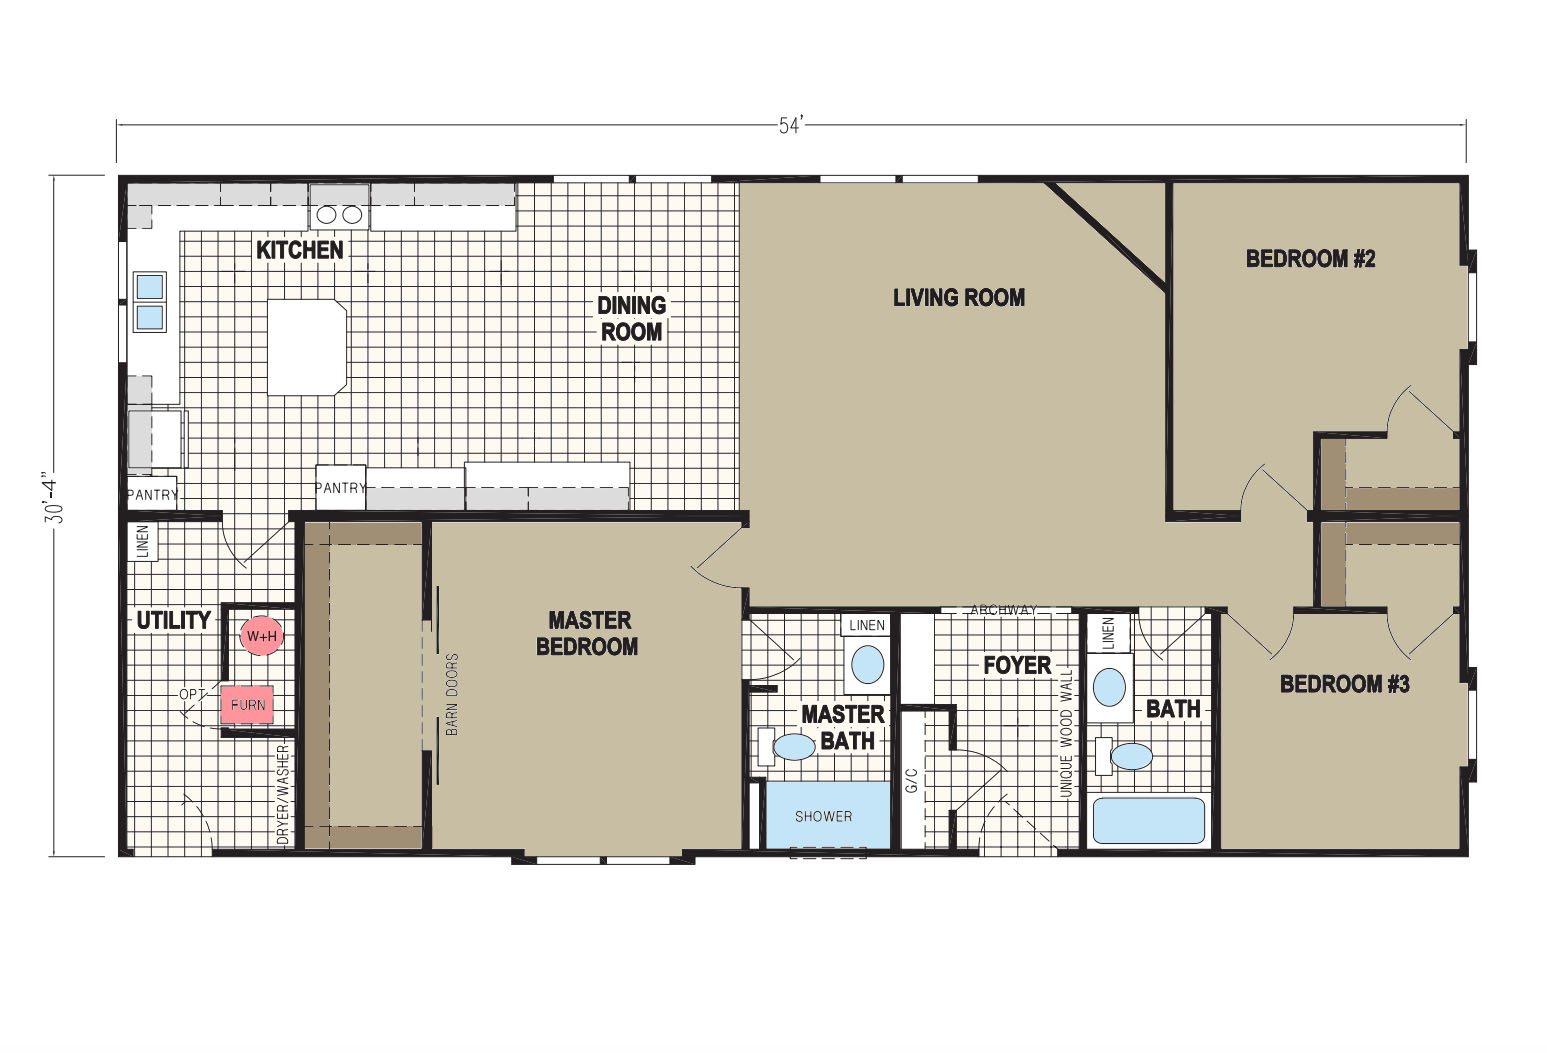 floorplan image for unit 325